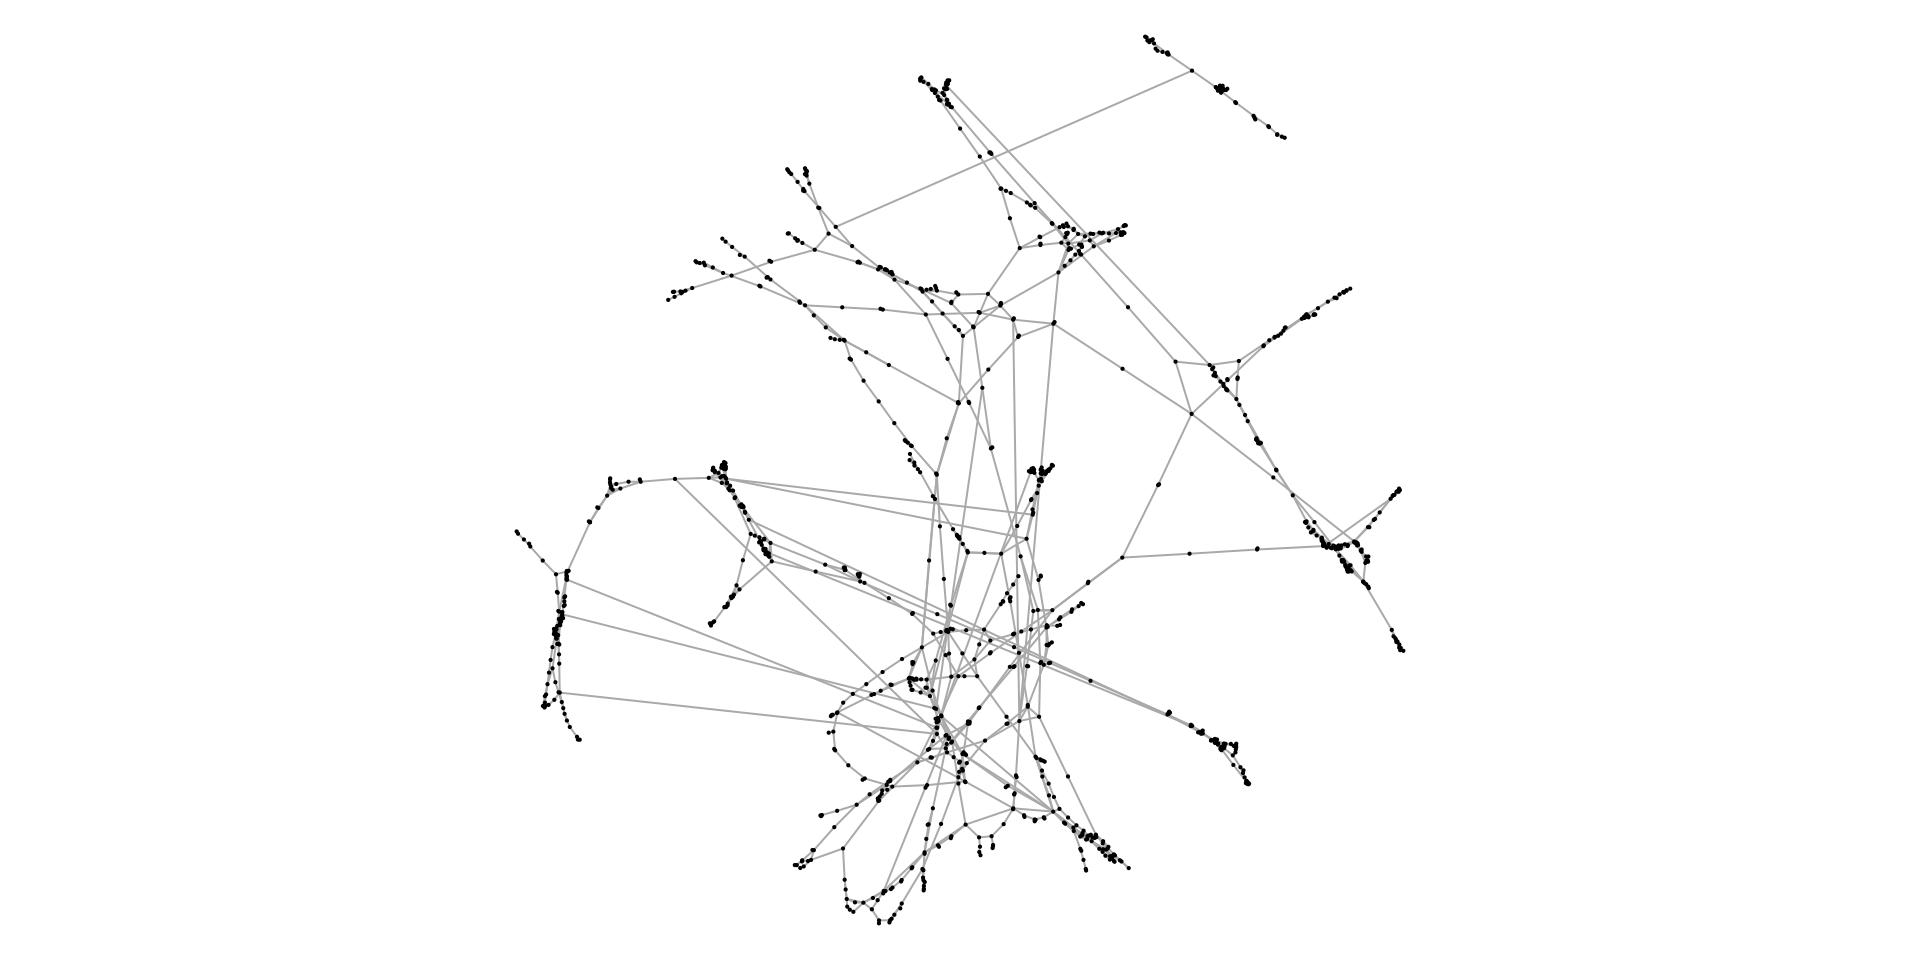 Stress based graph layouts